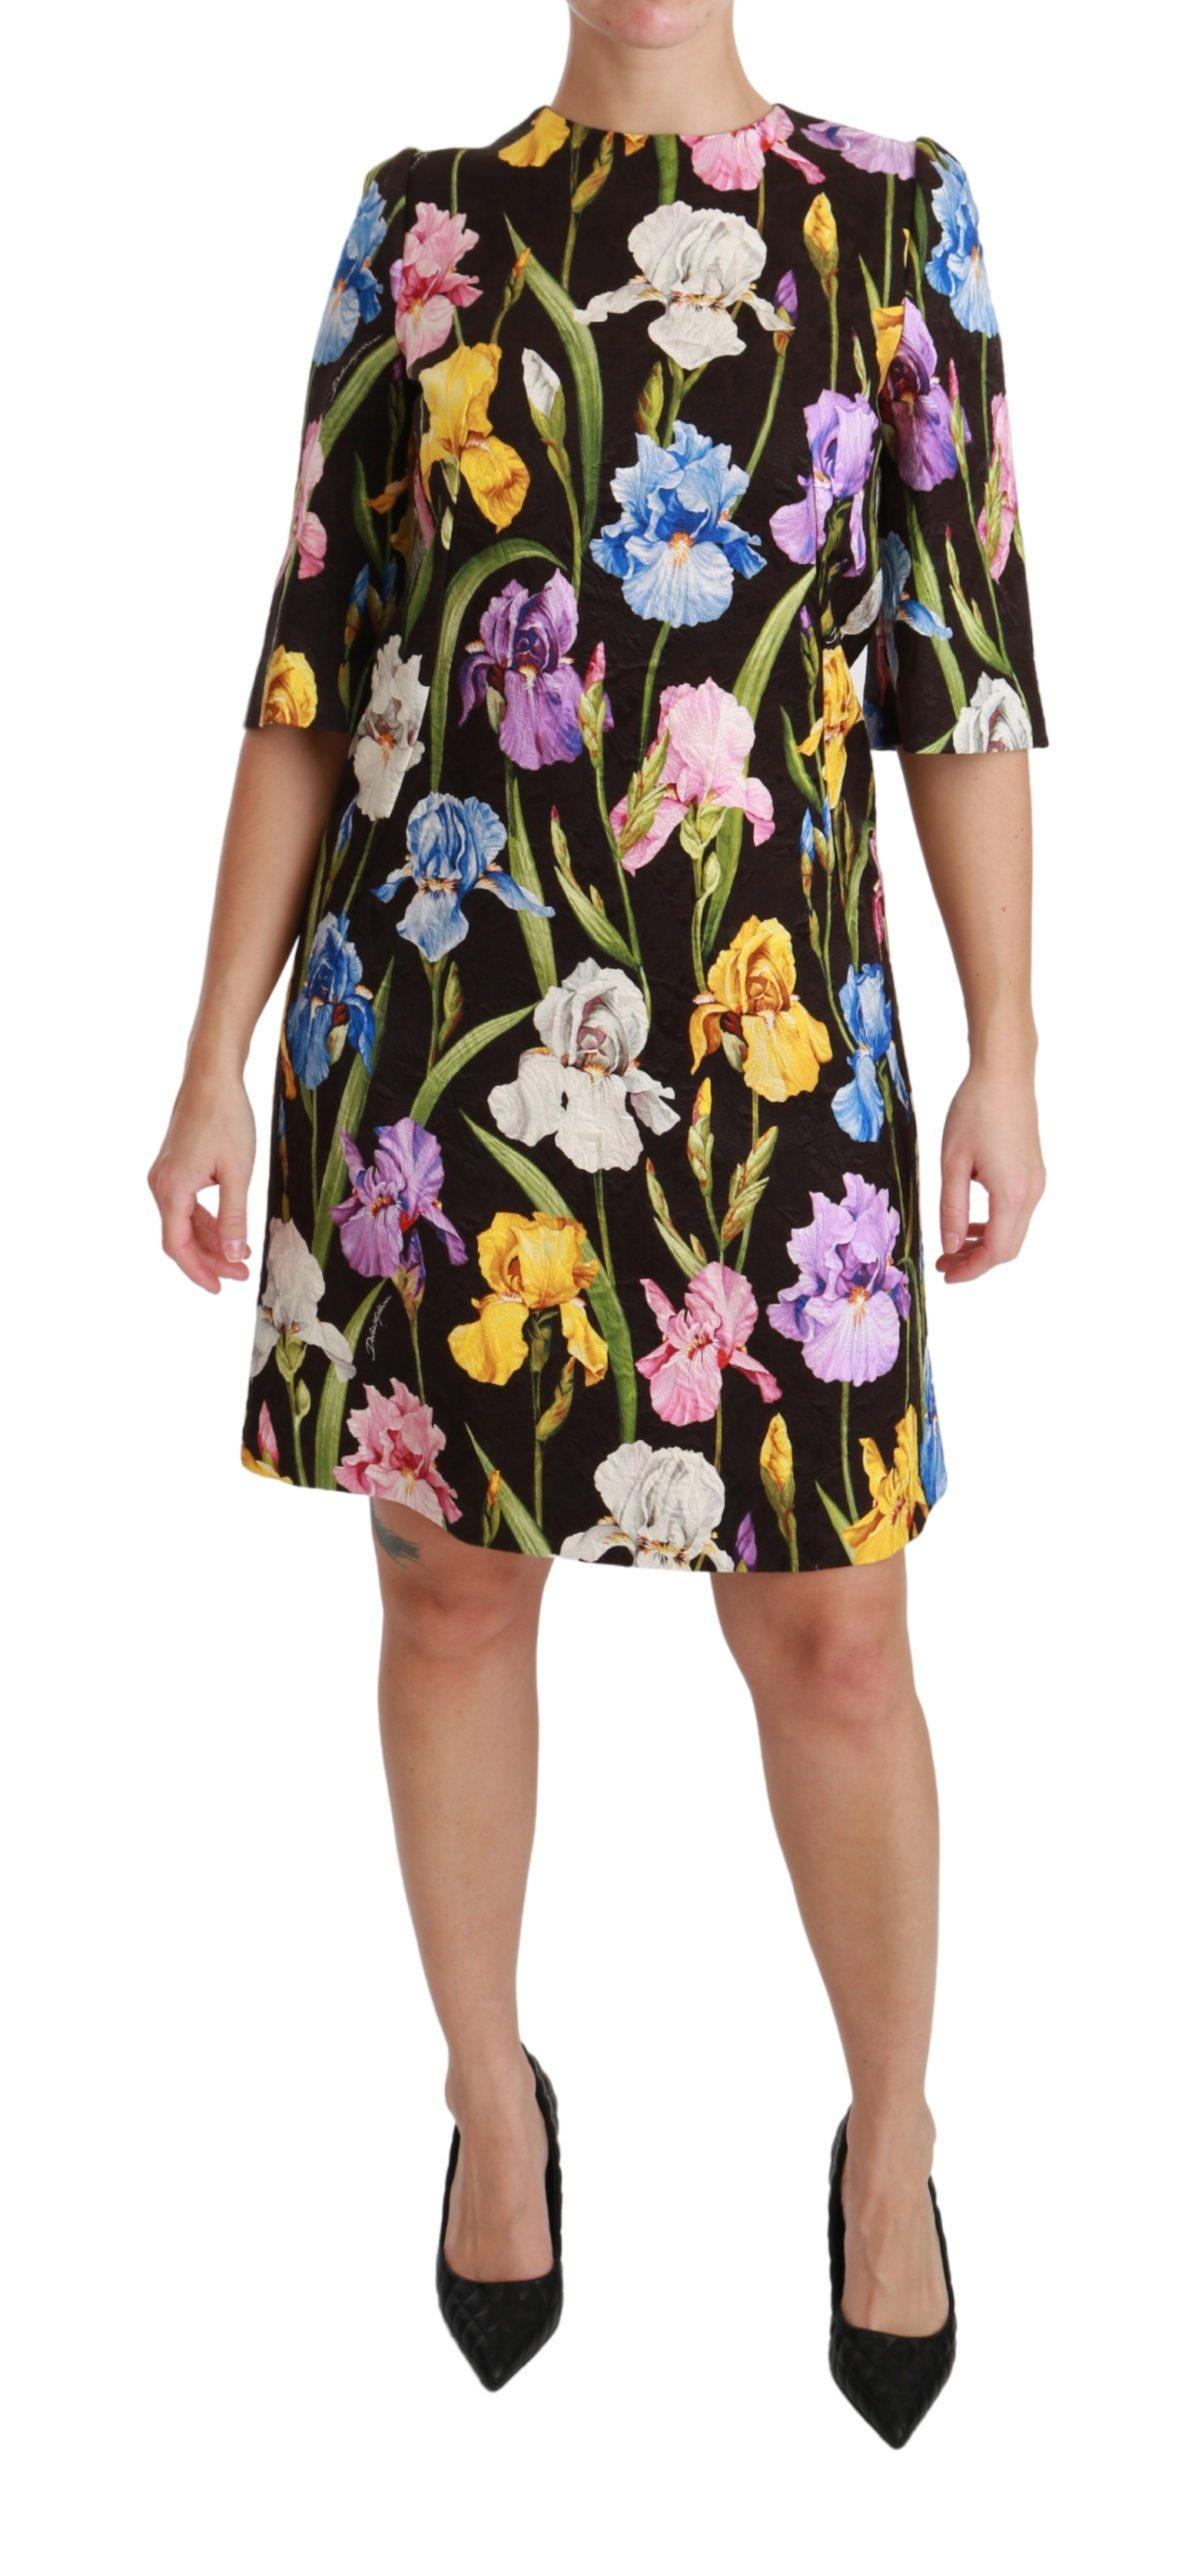 Dolce & Gabbana Women's Cotton Silk Floral Shift Dress Black DR2544 - IT38|XS